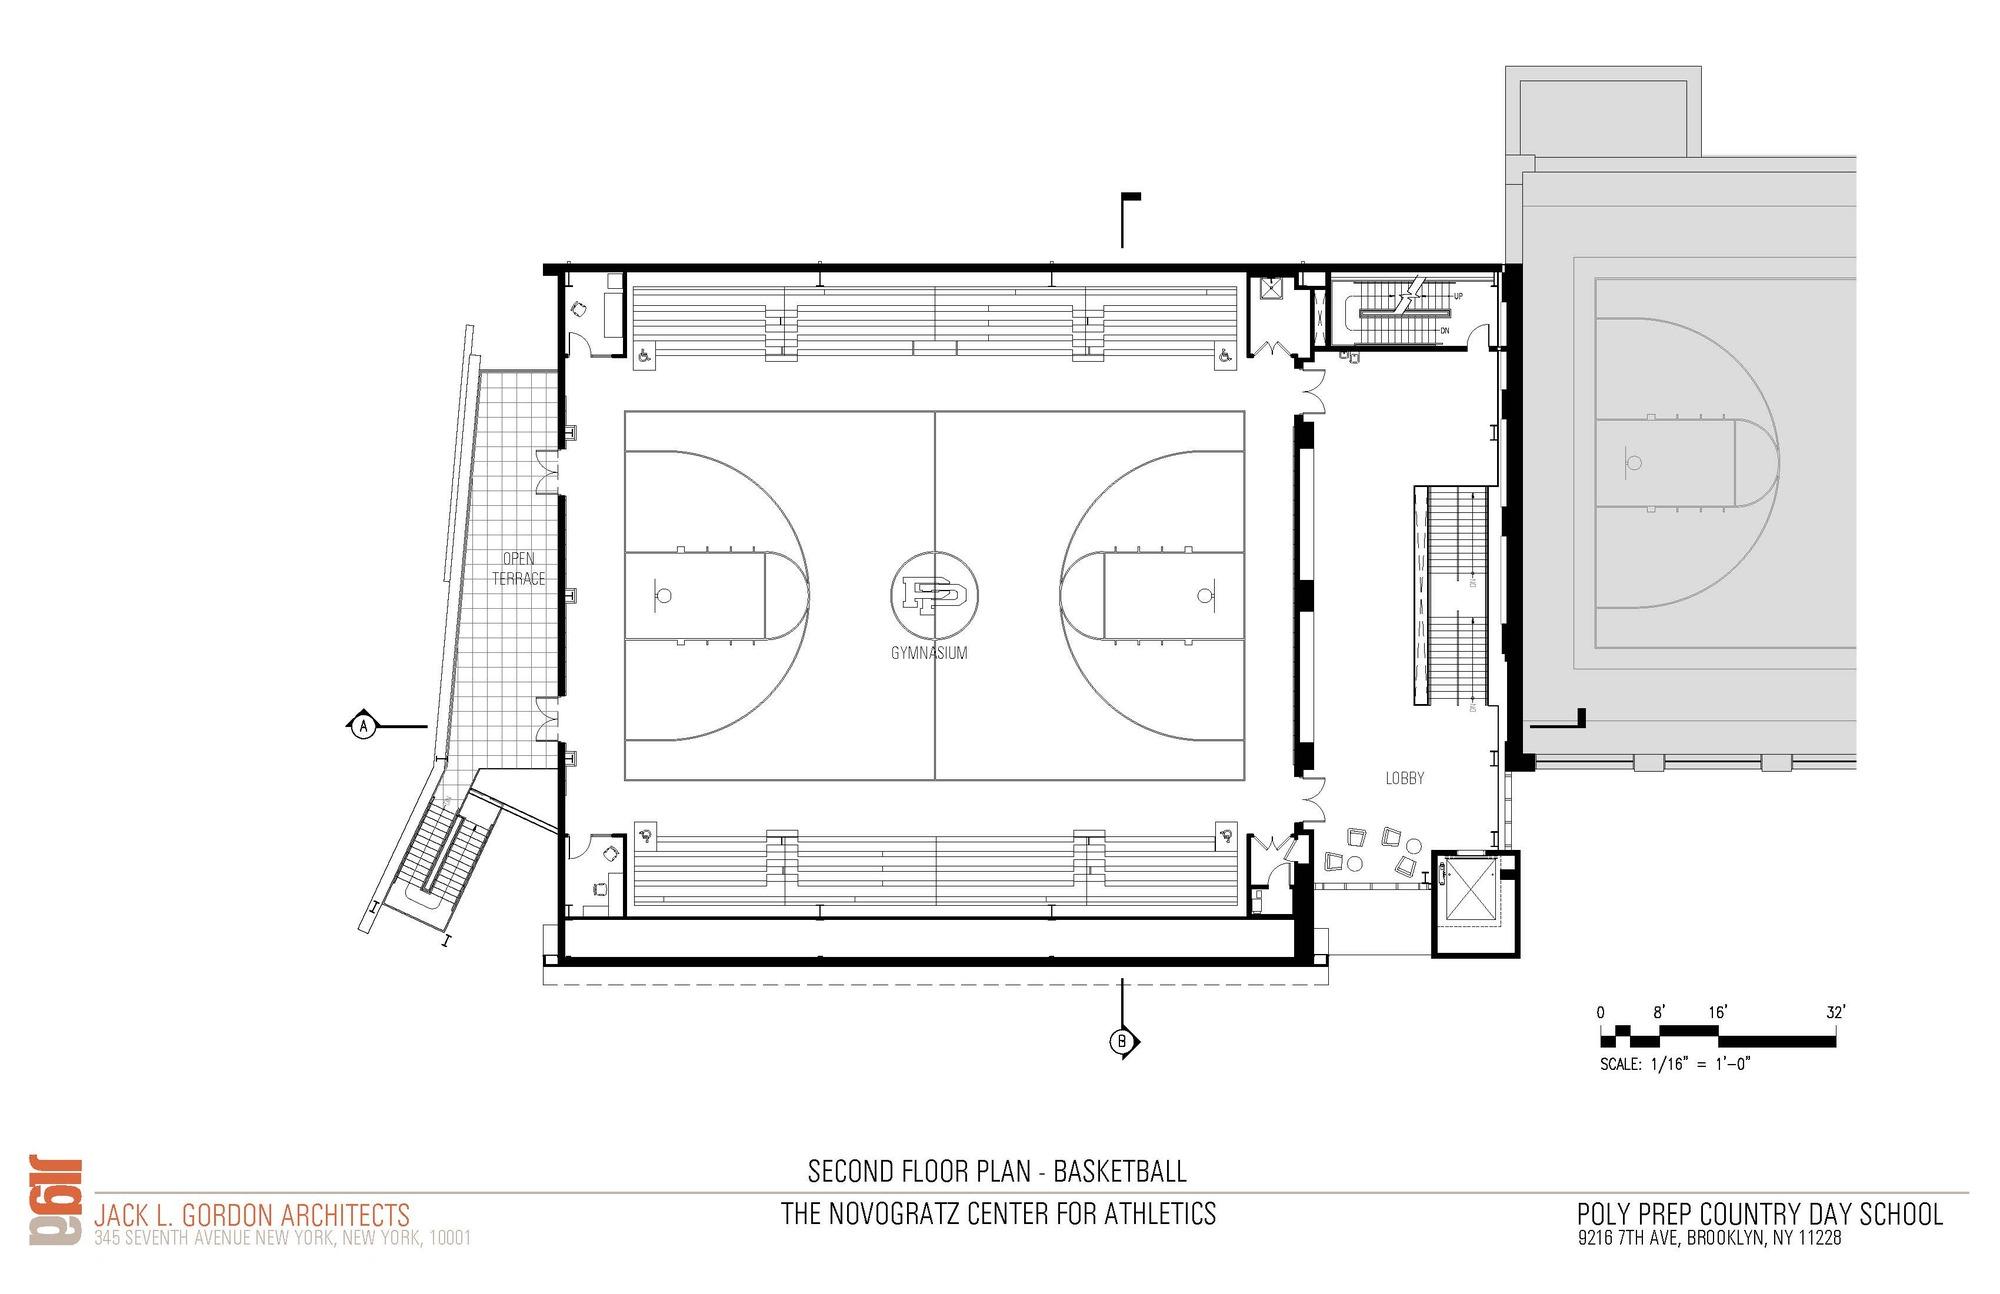 Basketball Court Floor Plan: Gallery Of Novogratz Center For Athletics / Jack L. Gordon